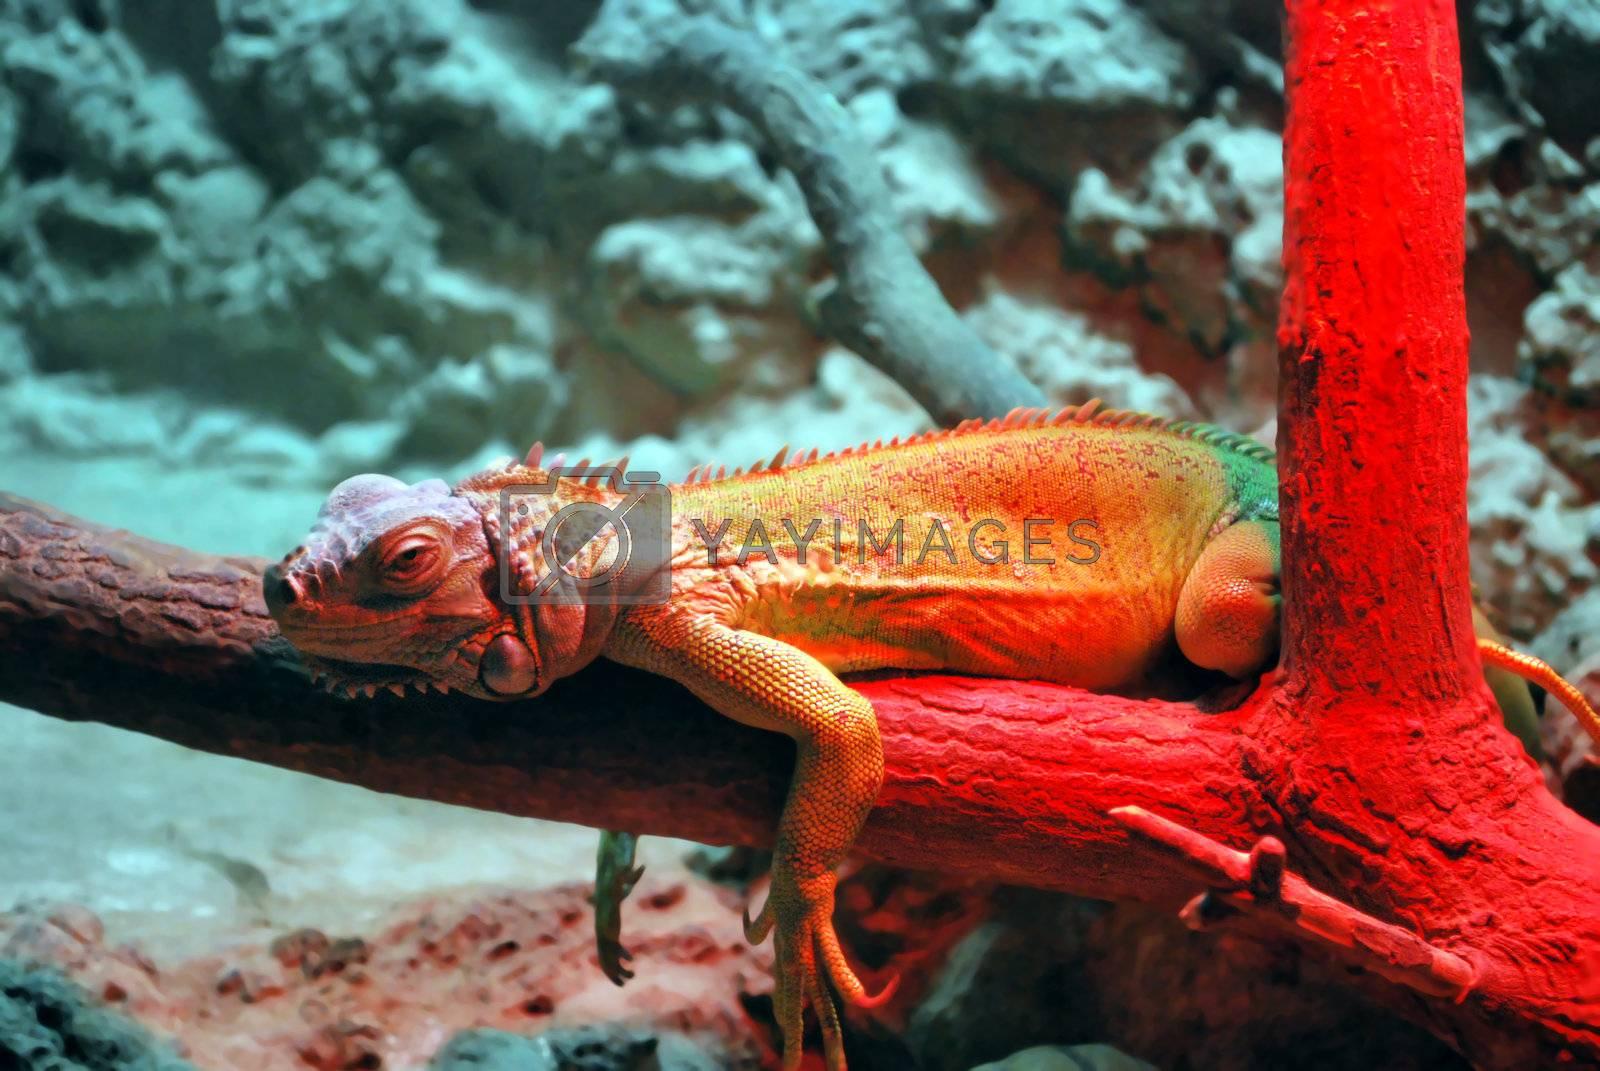 Royalty free image of Reptile On Red by Skovoroda